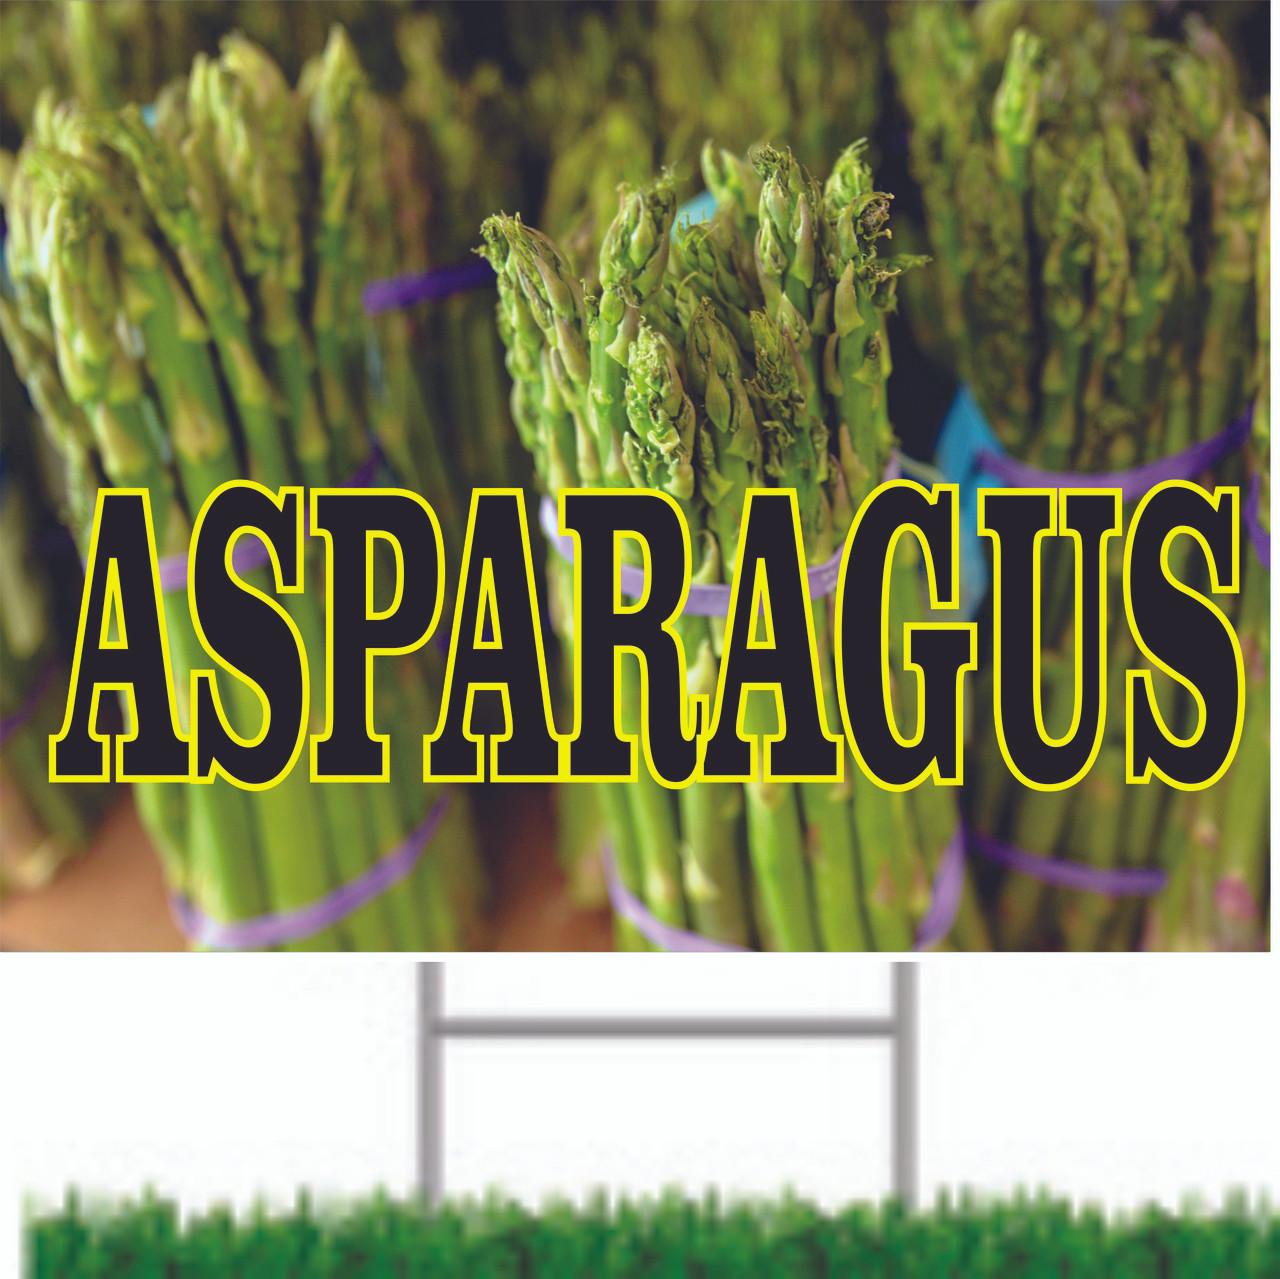 Asparagus Road Sign Brings In Customers.